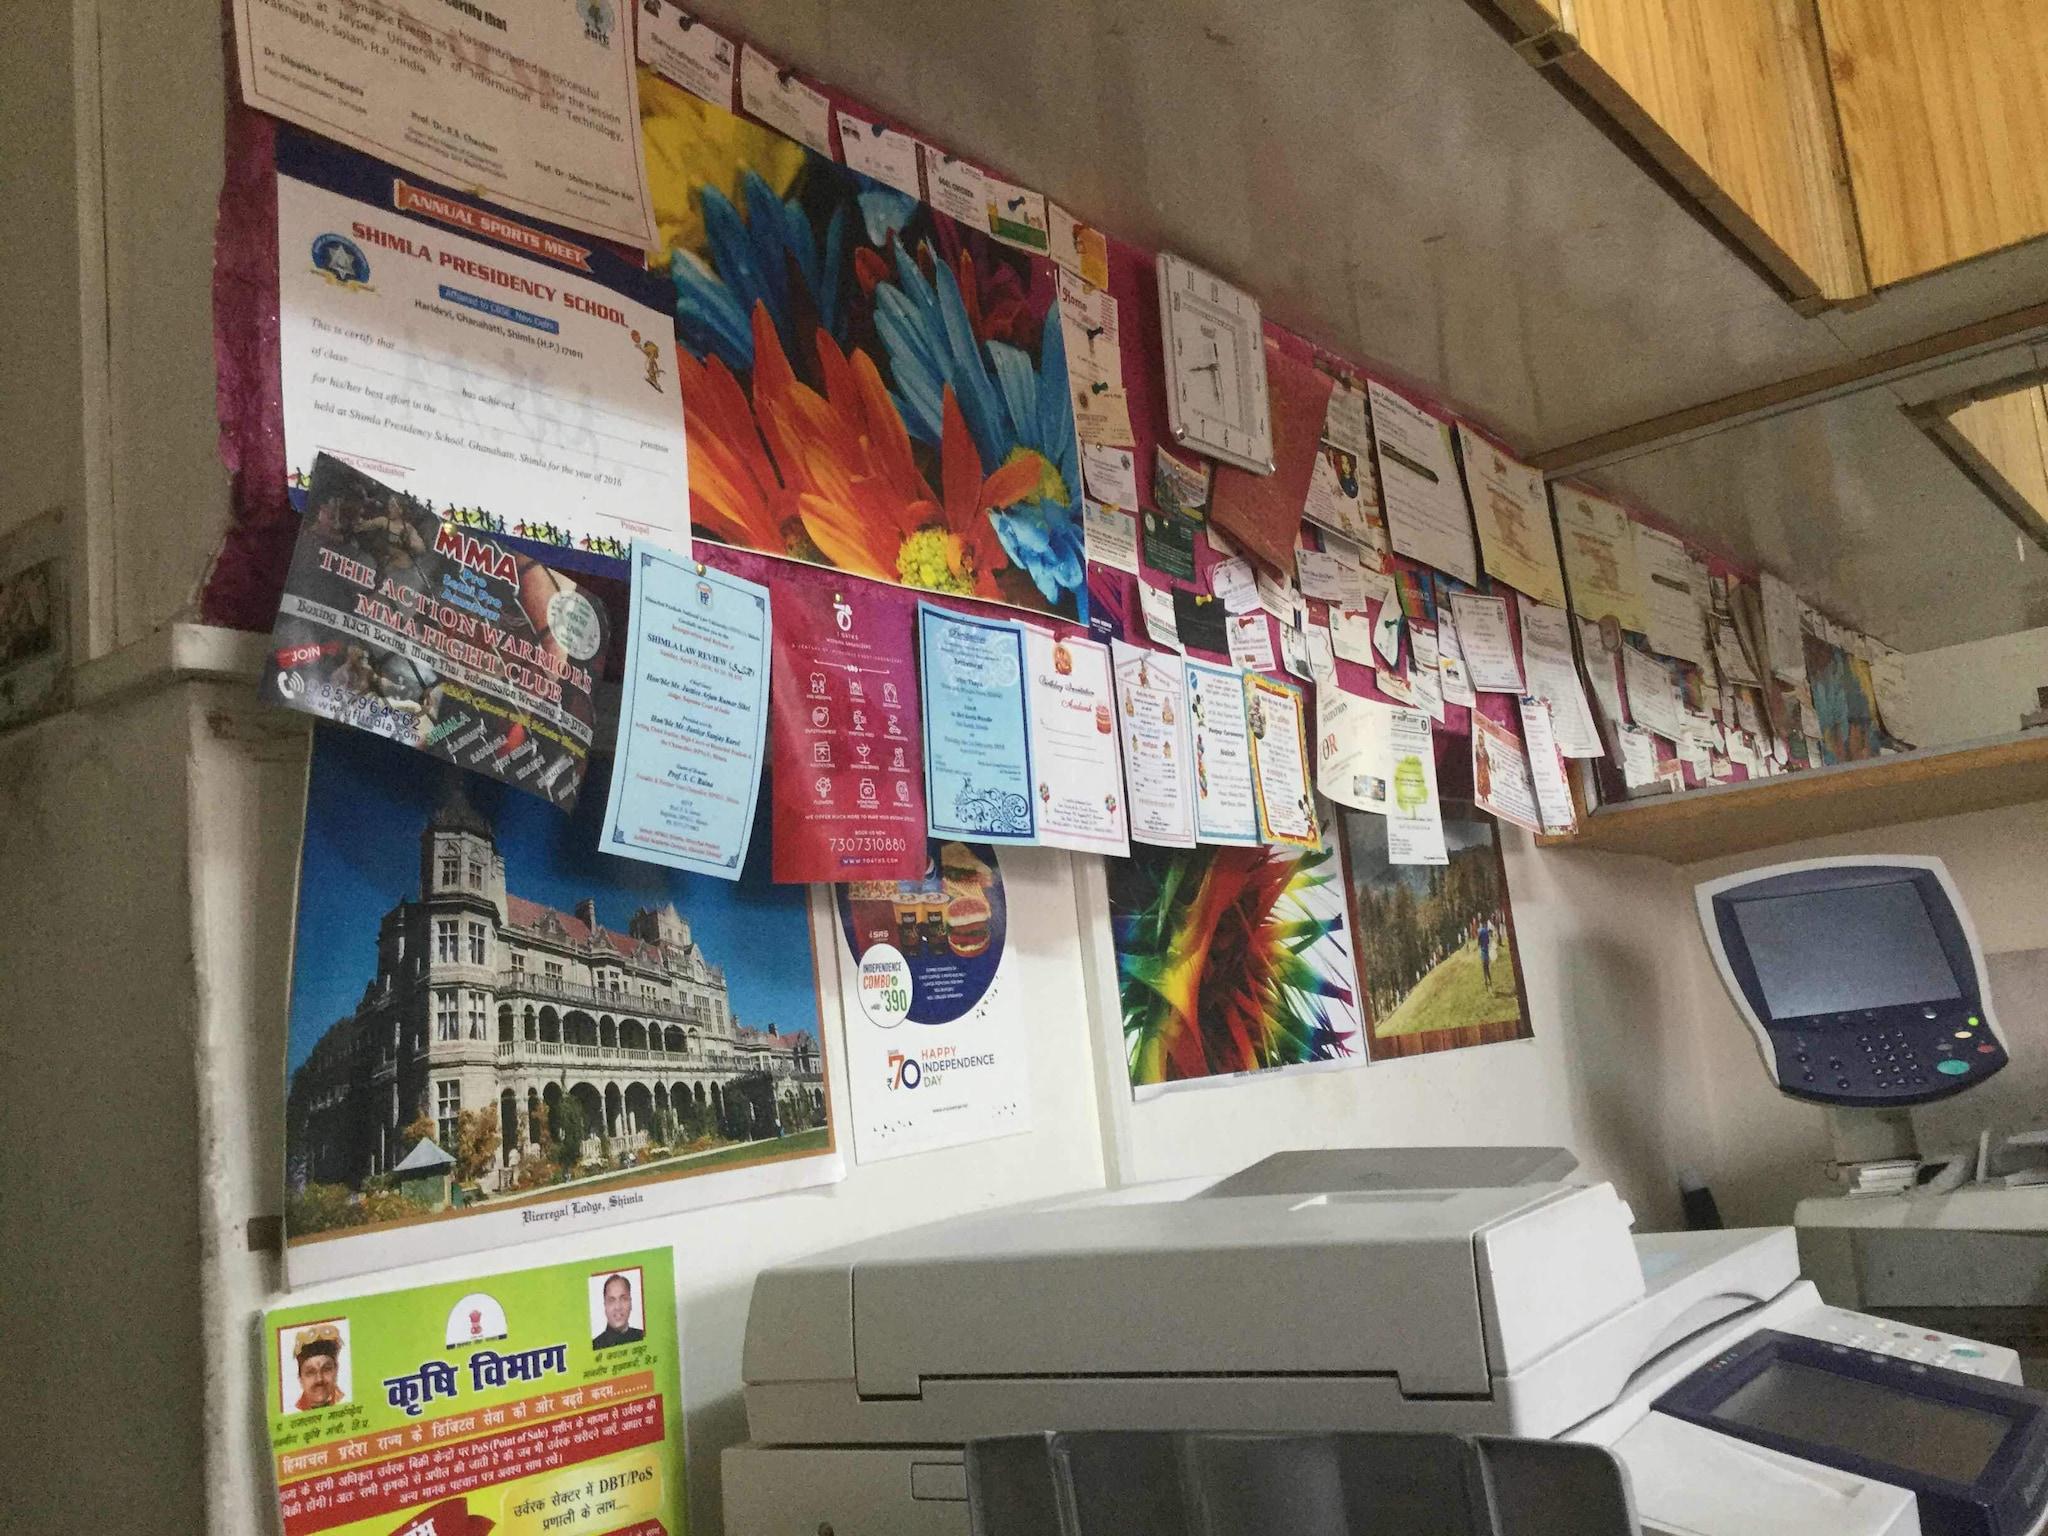 Printing Press in Shimla - Printing Services - Justdial